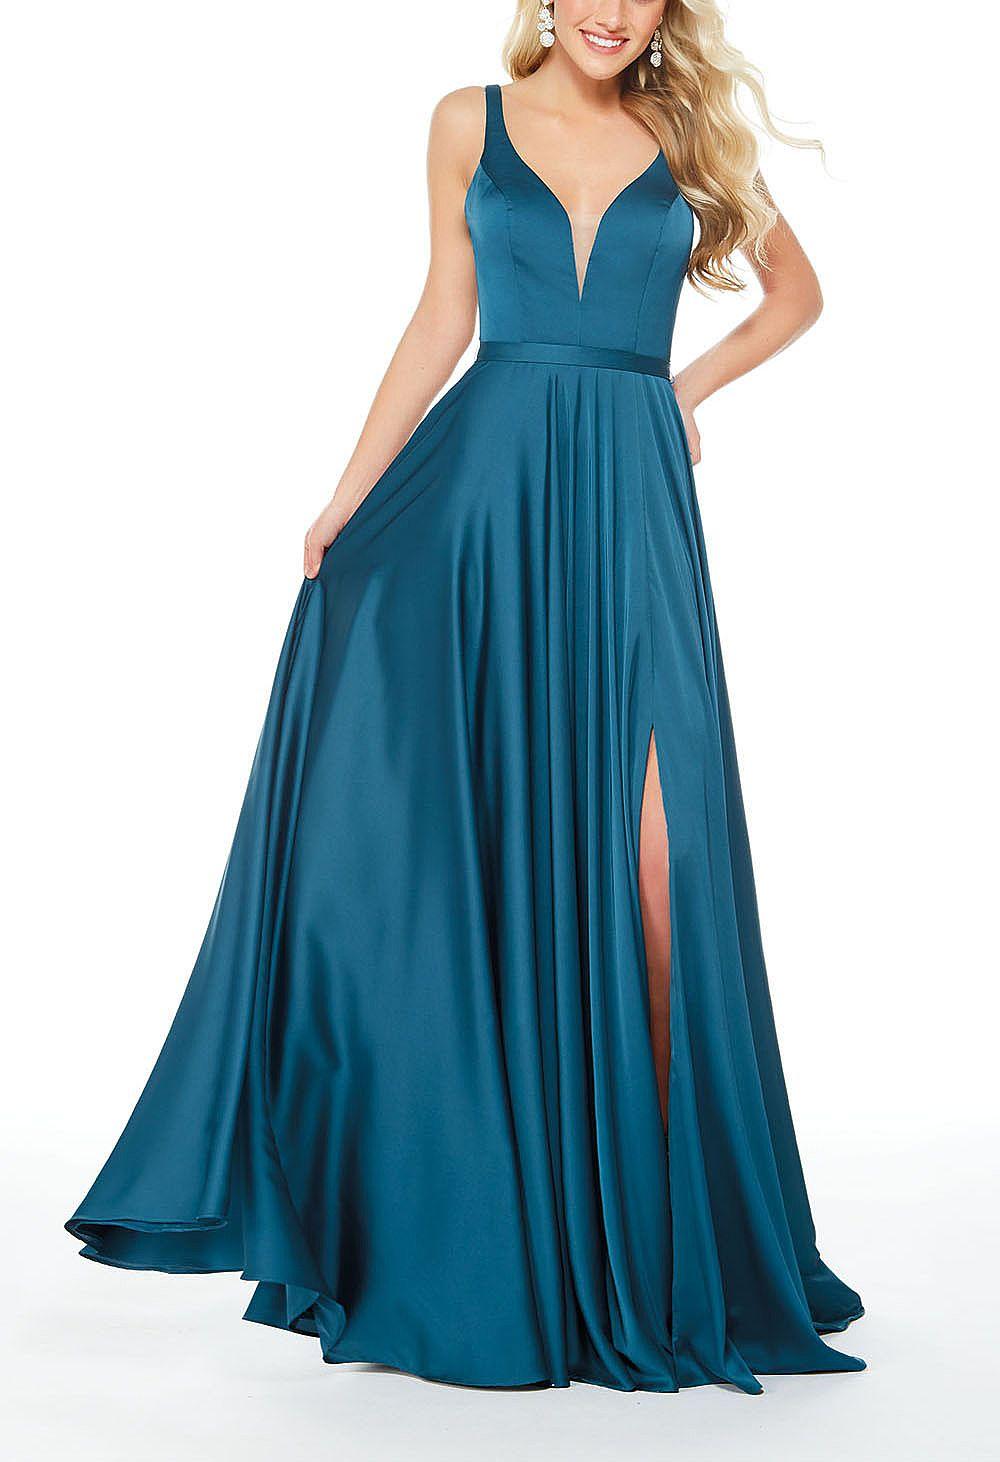 Gorgeous Flowy Side Slit Prom Dresses with Deep V-Neck